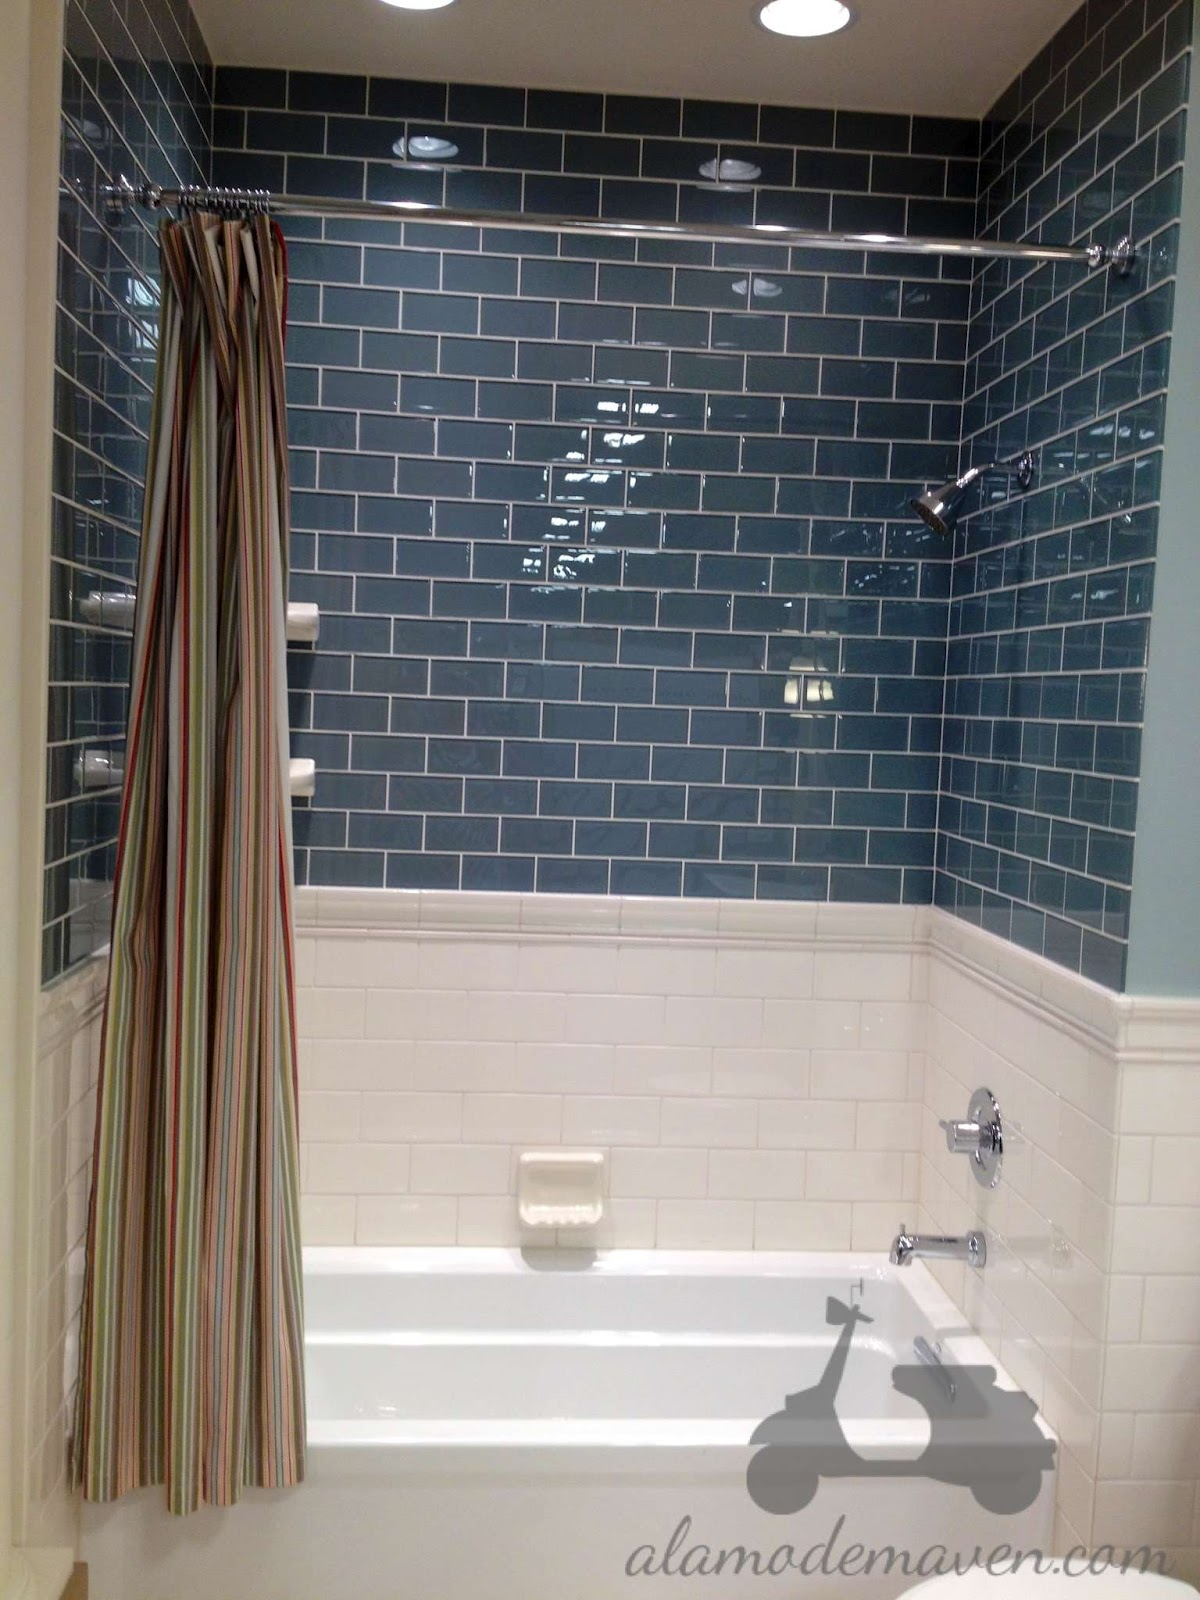 Glass Tile Shower on Pinterest  Glass Tiles Tile and Subway Tile Showers